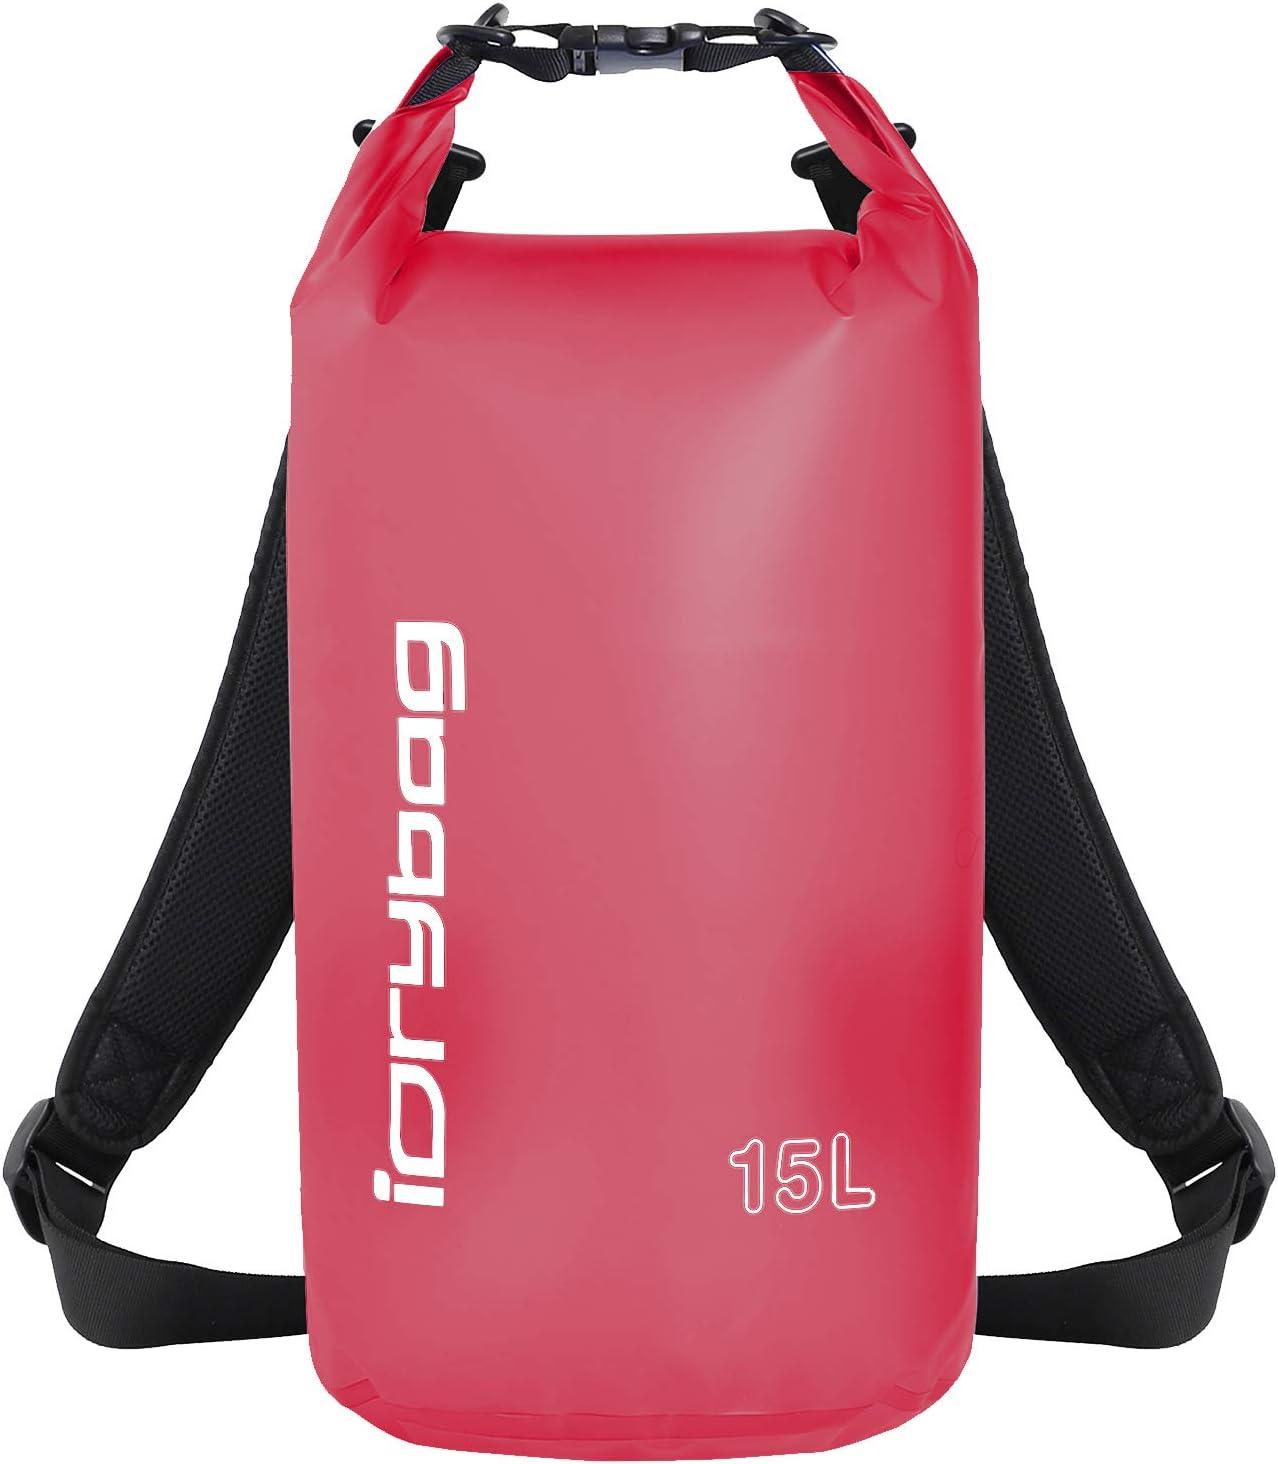 IDRYBAG Clear Dry Time sale Bag Waterproof Floating 5L 15L Opening large release sale 10L 2L 20L Lig